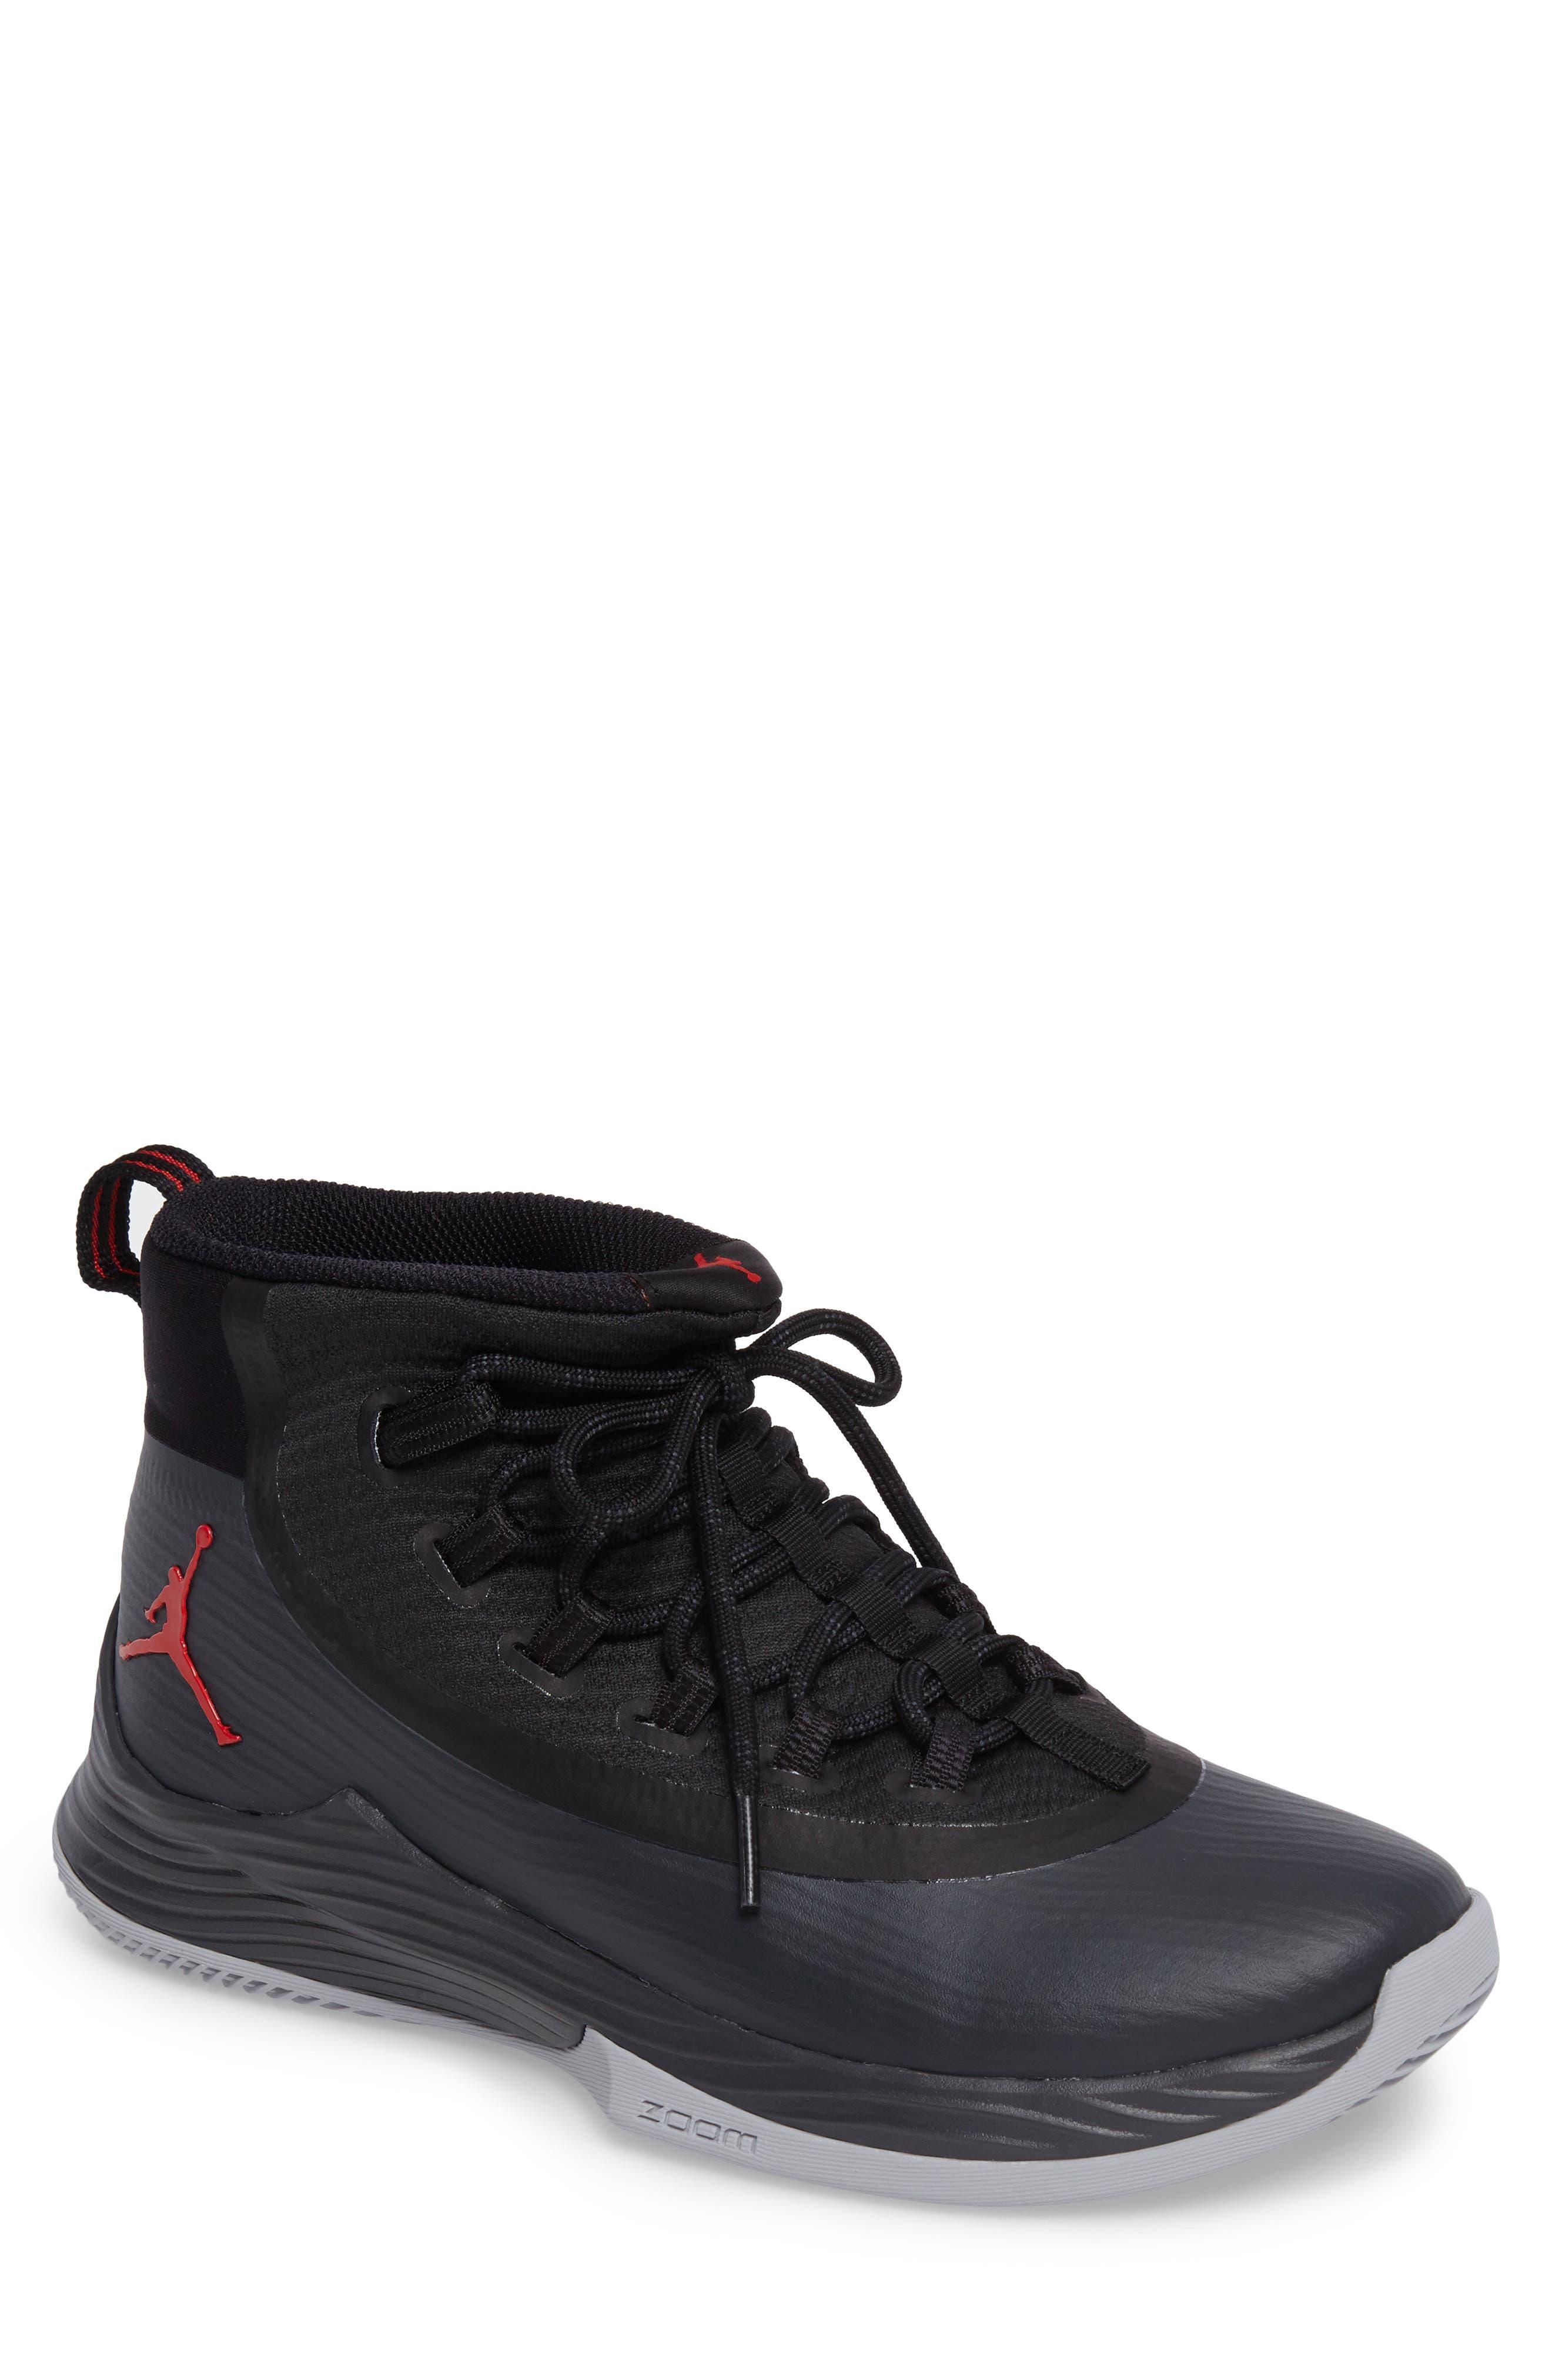 Jordan Ultra Fly 2 Basketball Shoe,                         Main,                         color, 002